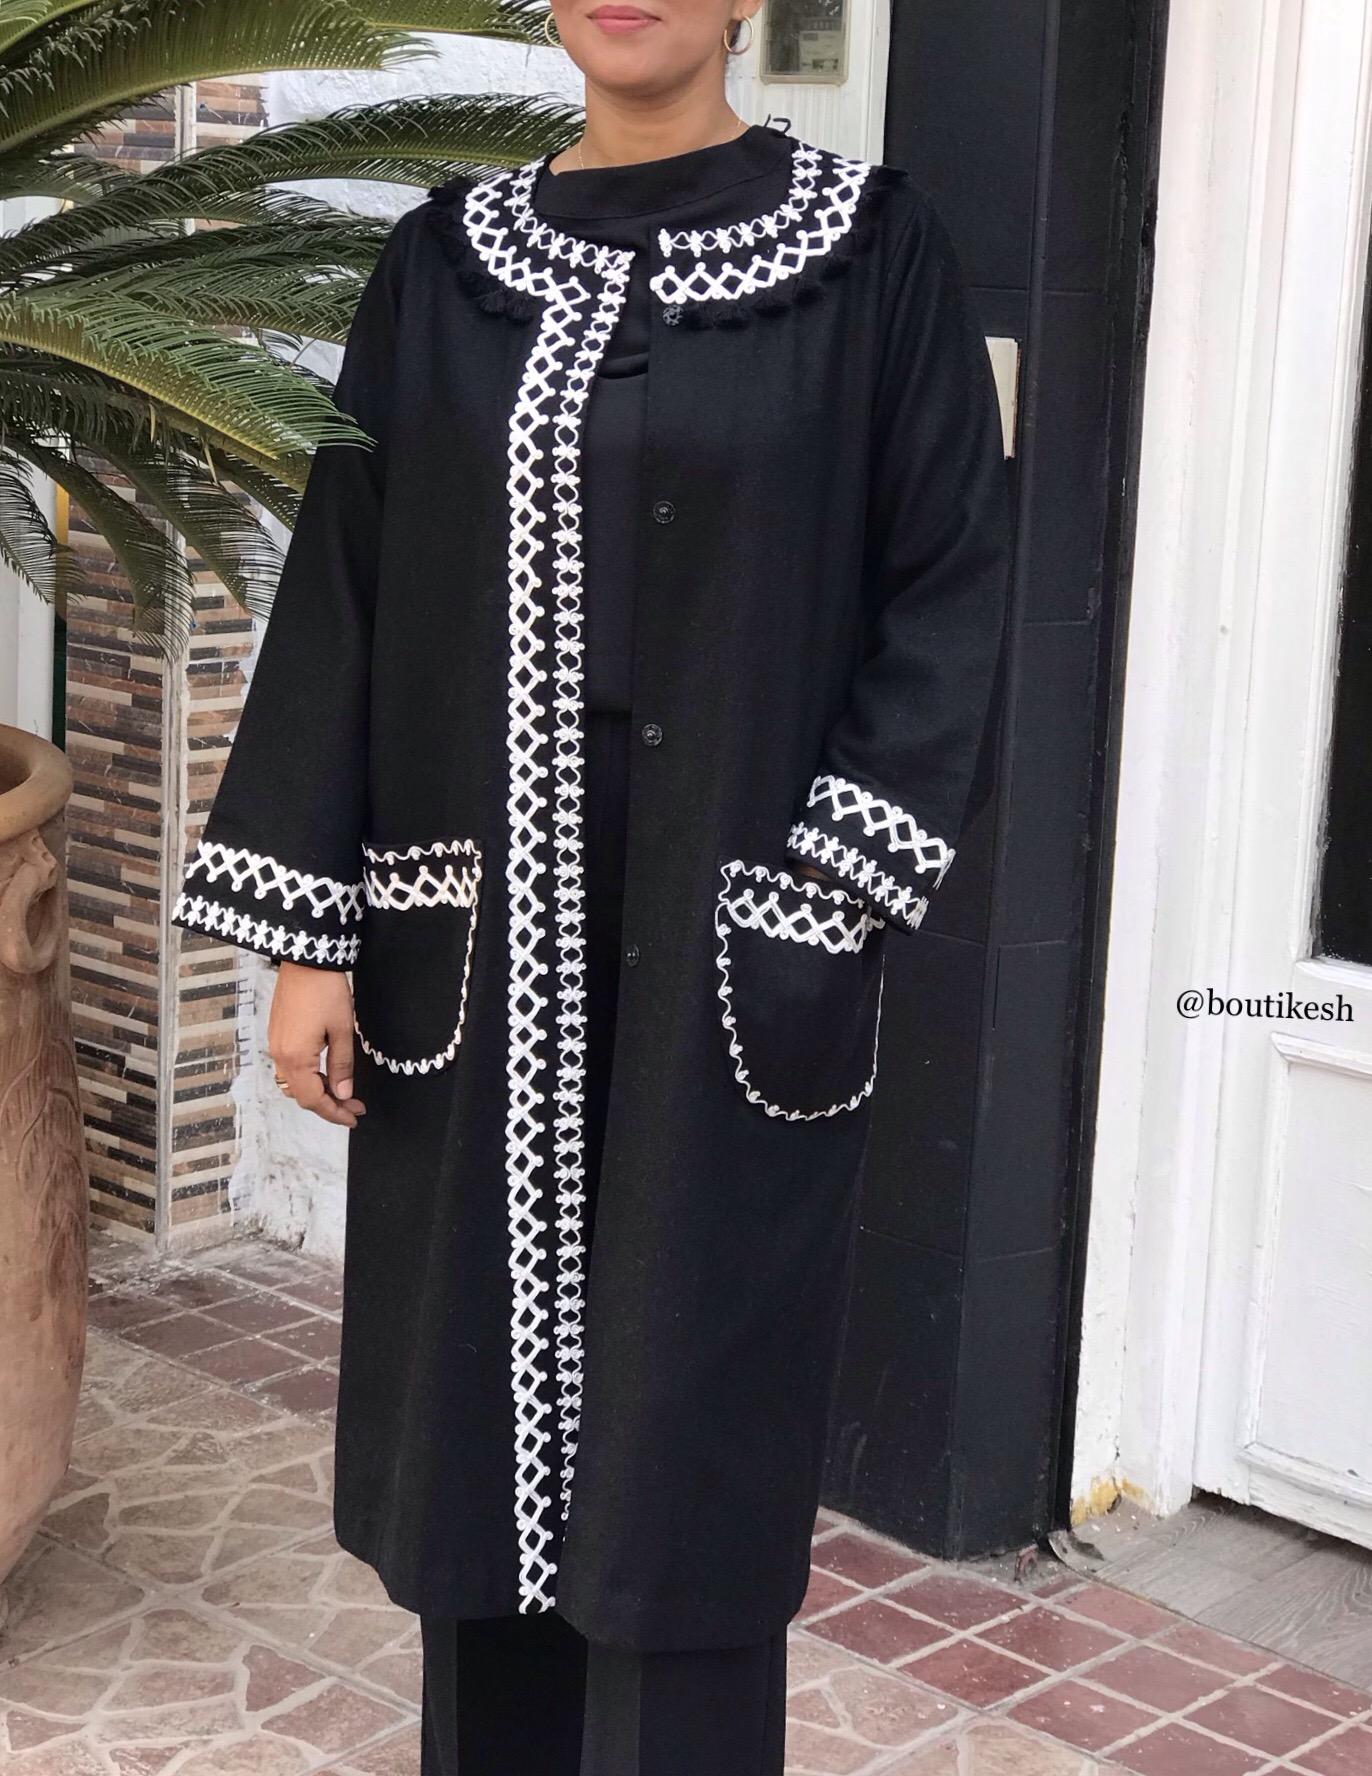 Coat flanelle black 3fil white & black pompons